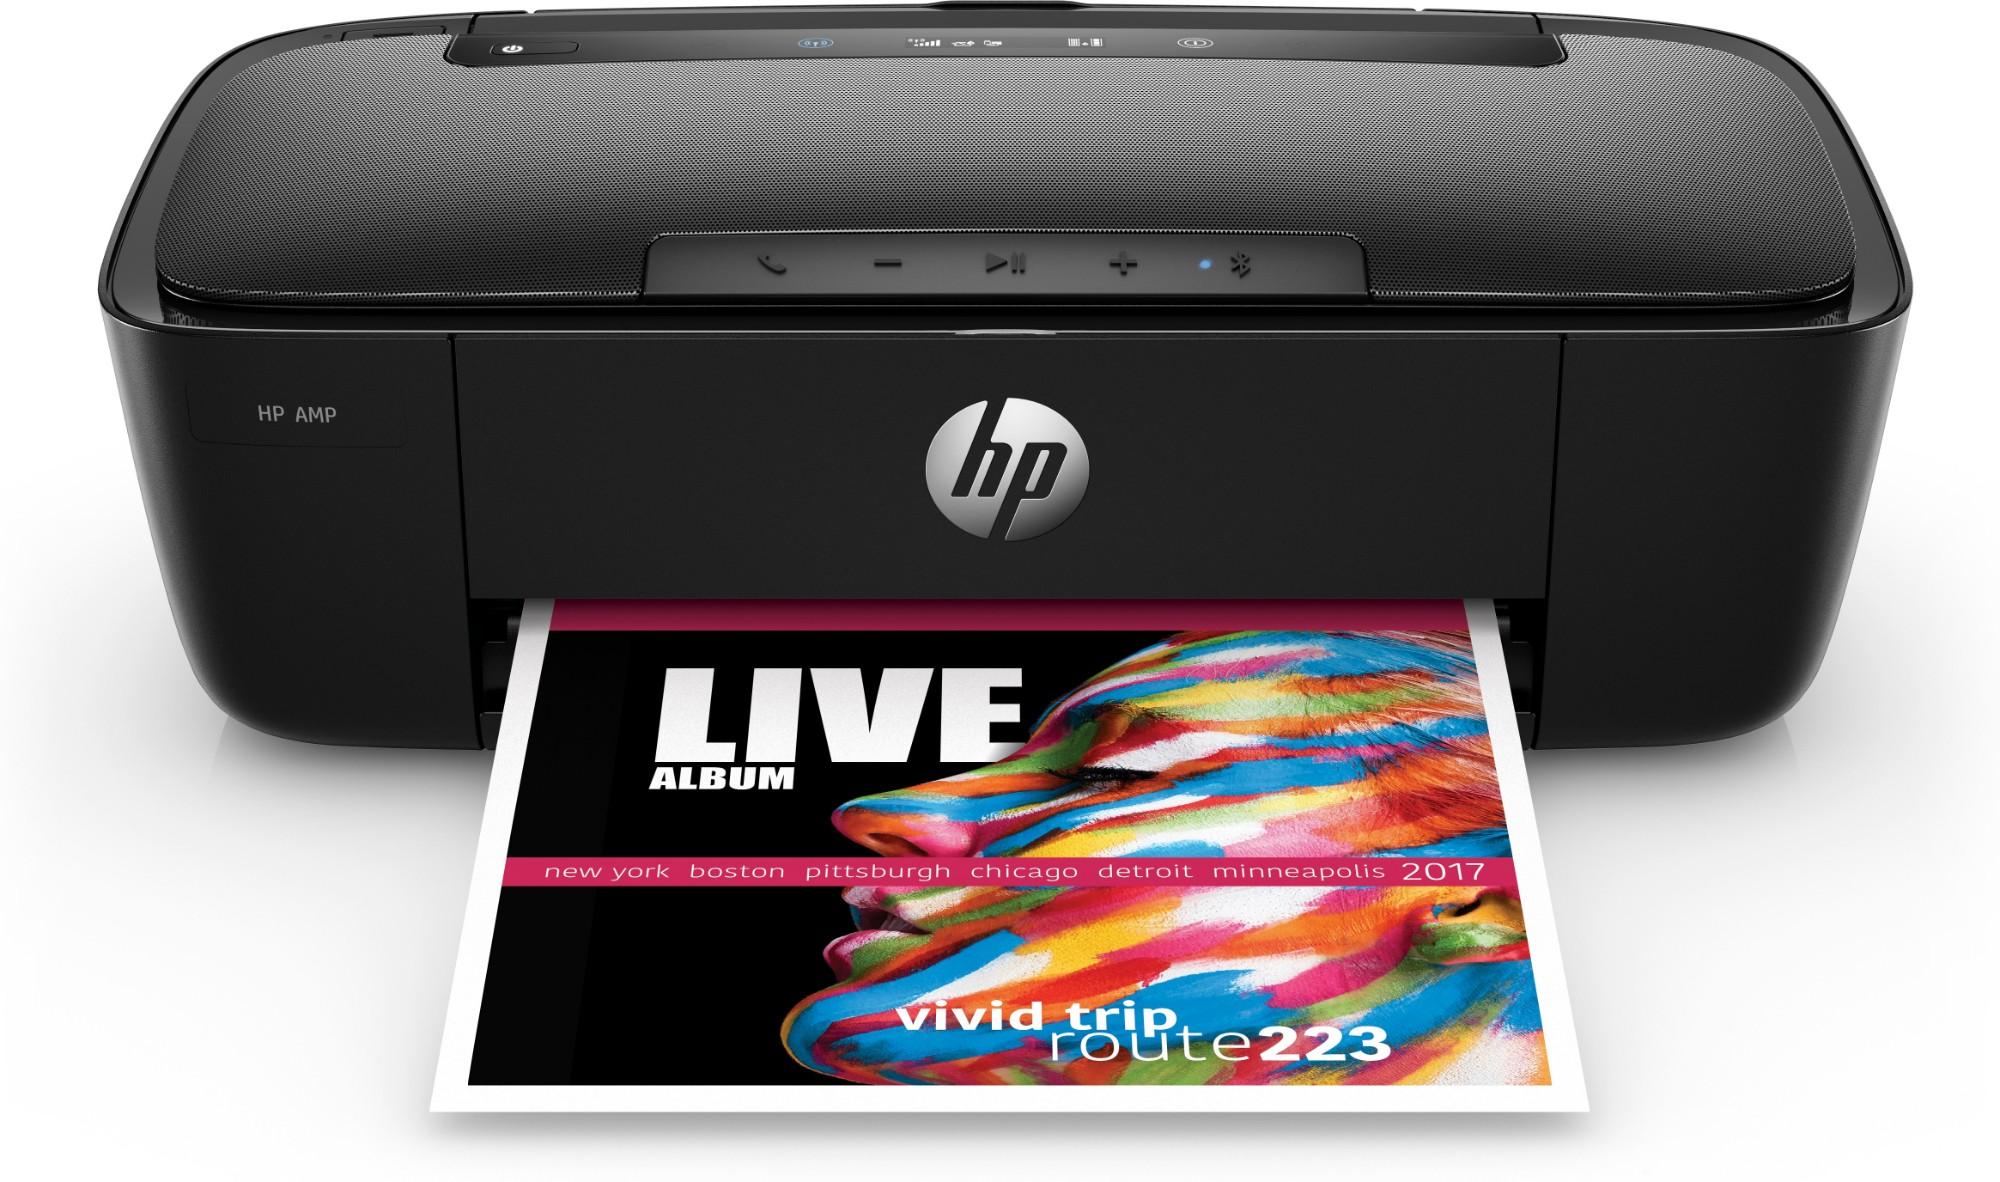 HP AMP 130 inkjet printer Colour 4800 x 1200 DPI A4 Wi-Fi